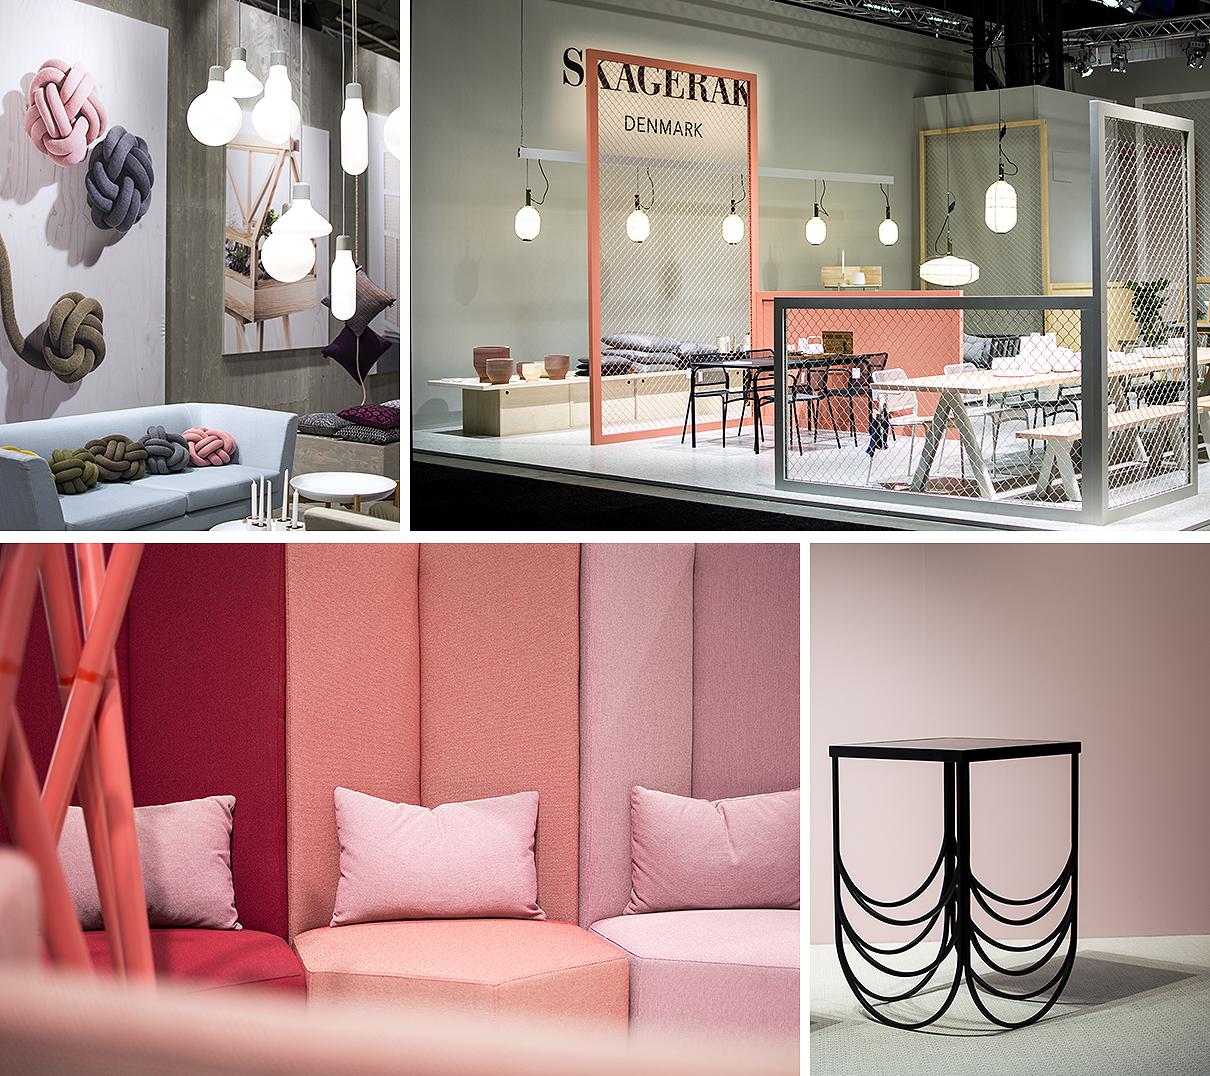 Stockholm Furniture Fair 2016: Designhouse Stockholm, Skagerak, Jonas Ihreborn, Kullaro – Husligheter